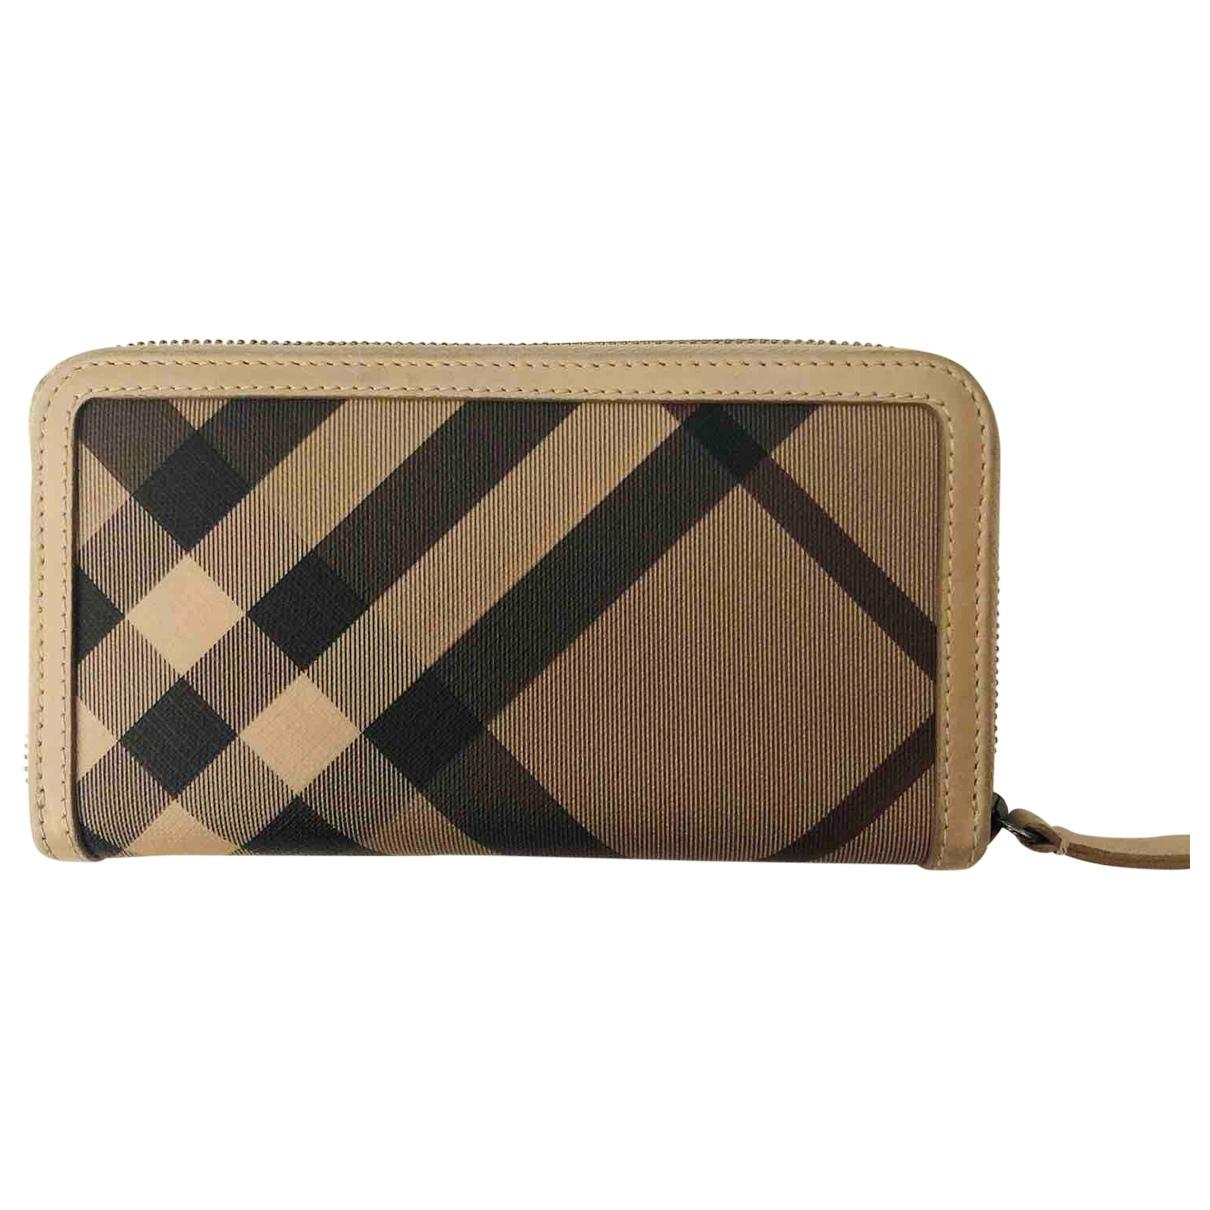 Burberry \N Beige Cloth wallet for Women \N